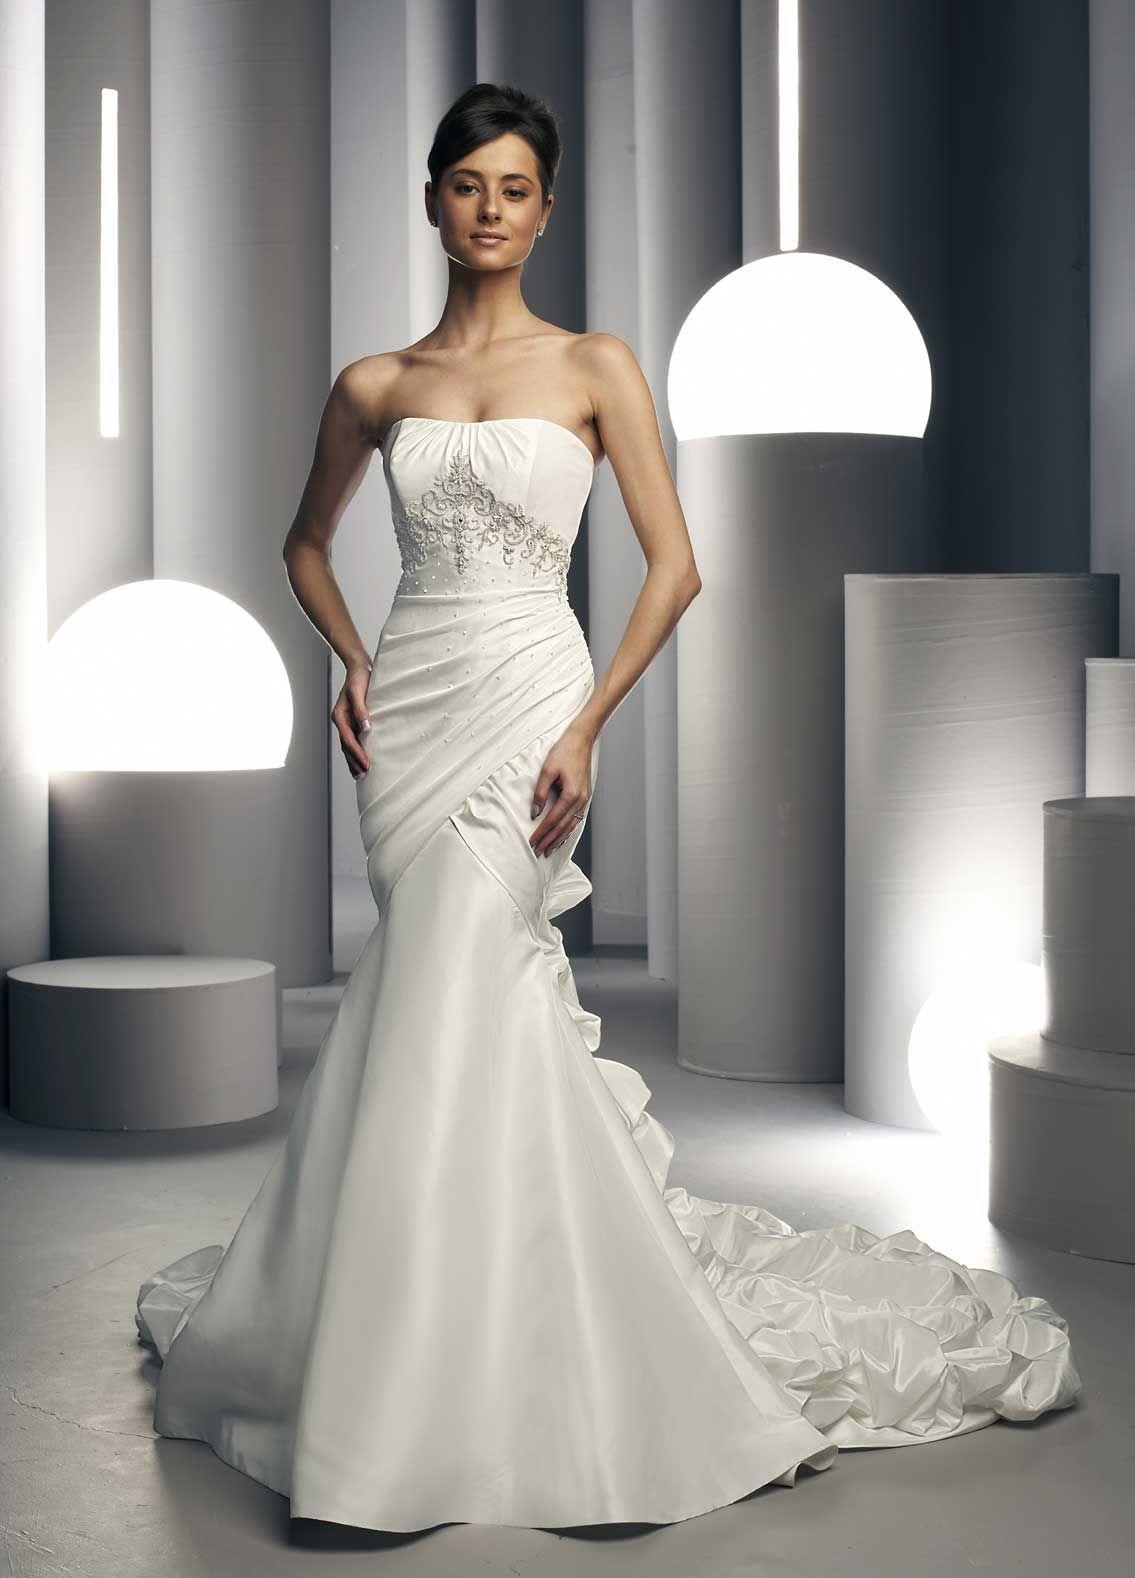 White Wedding Dresses | White Bridal's Dresses Designs | long ...